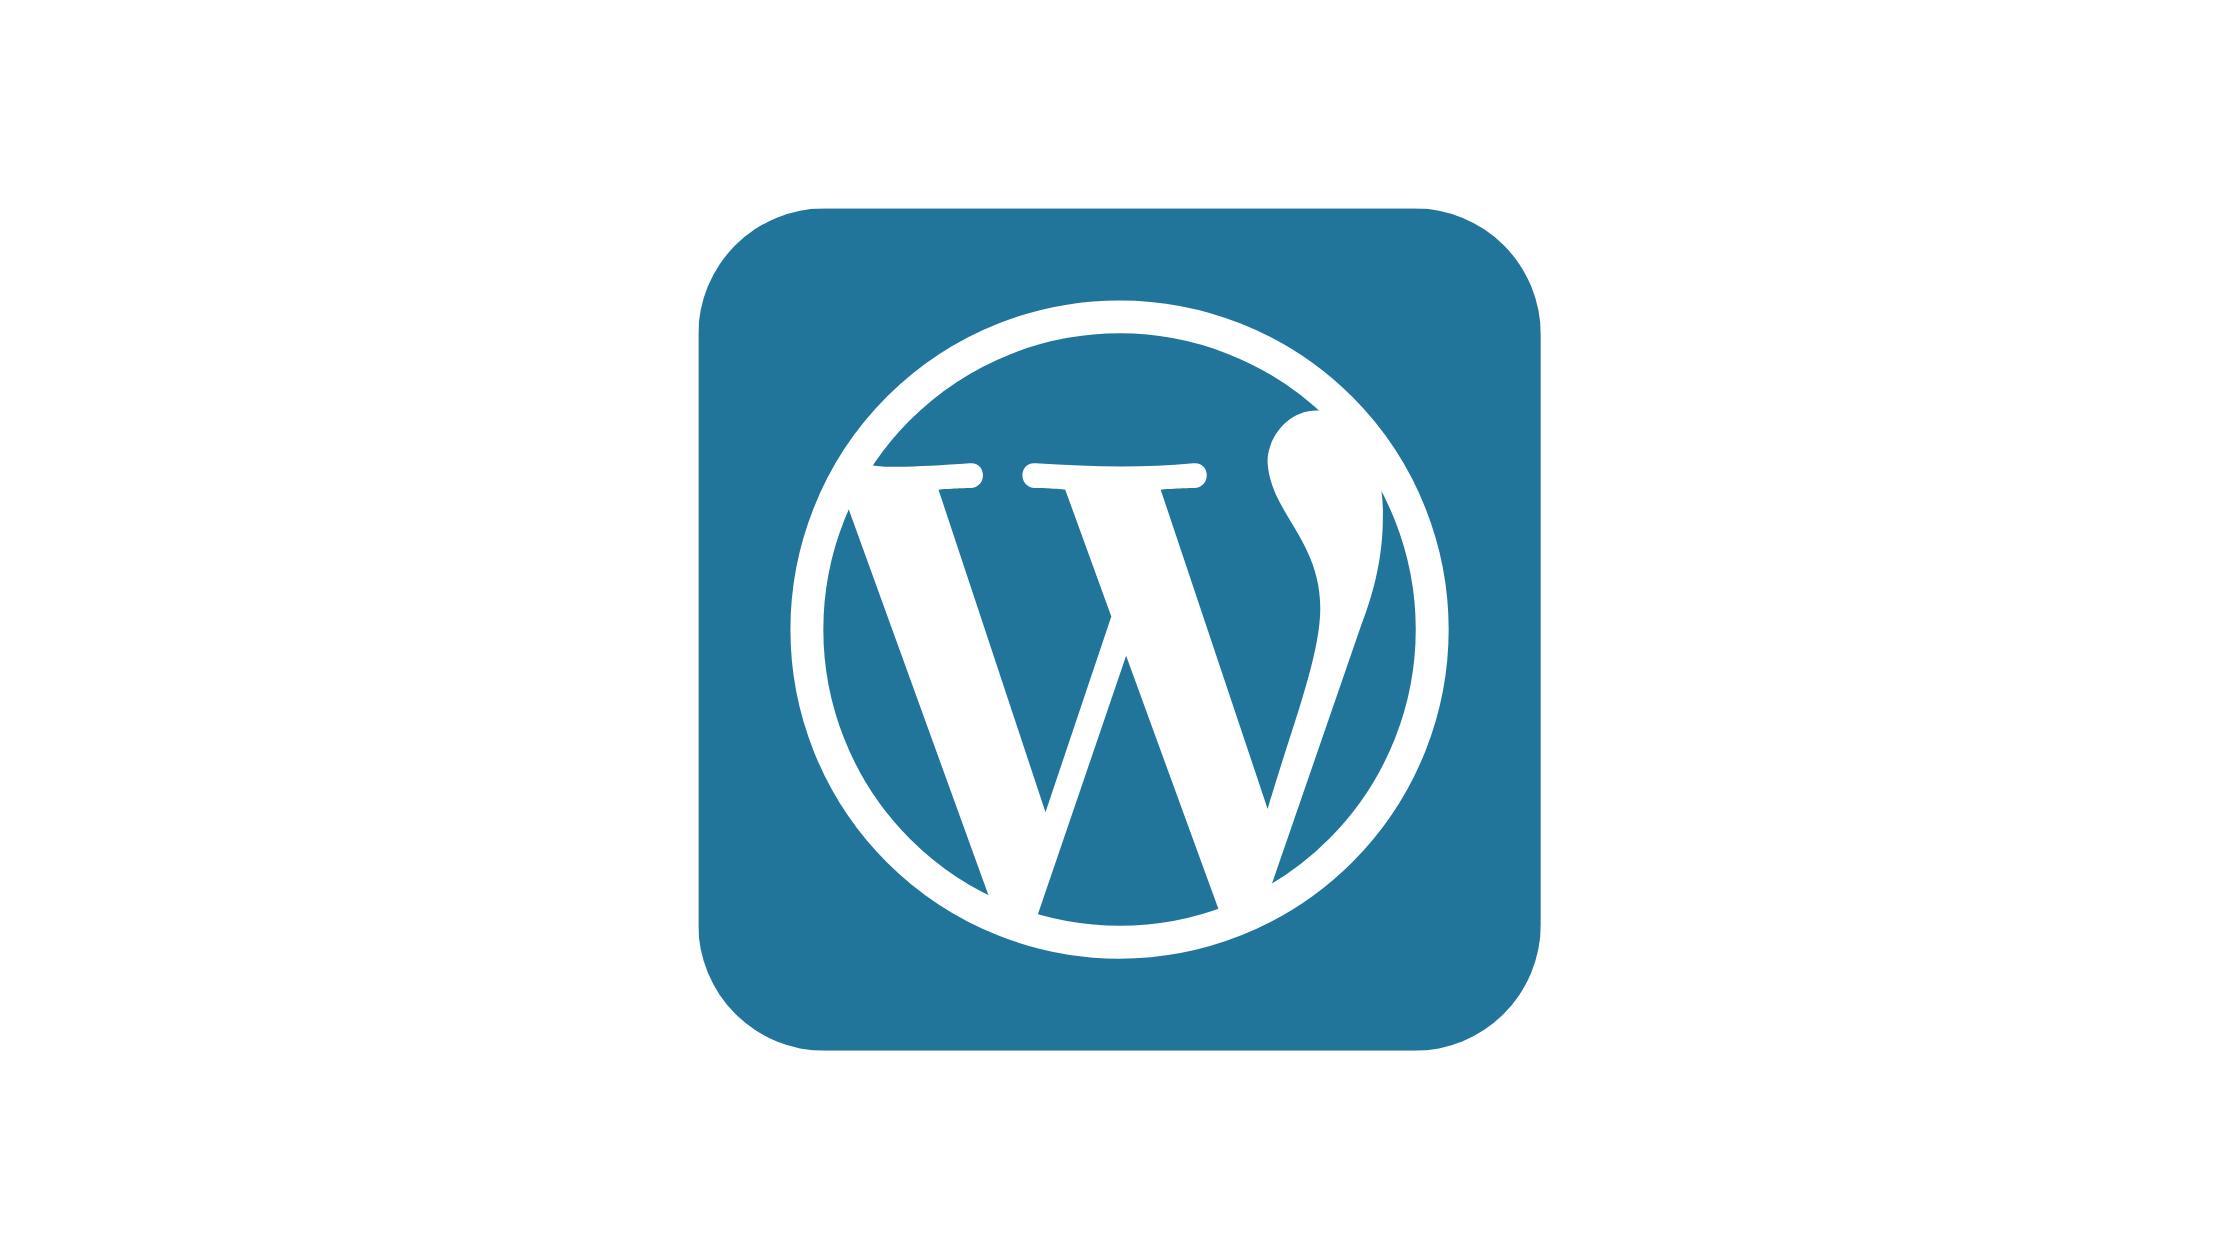 Install WordPress To Start Your Blog